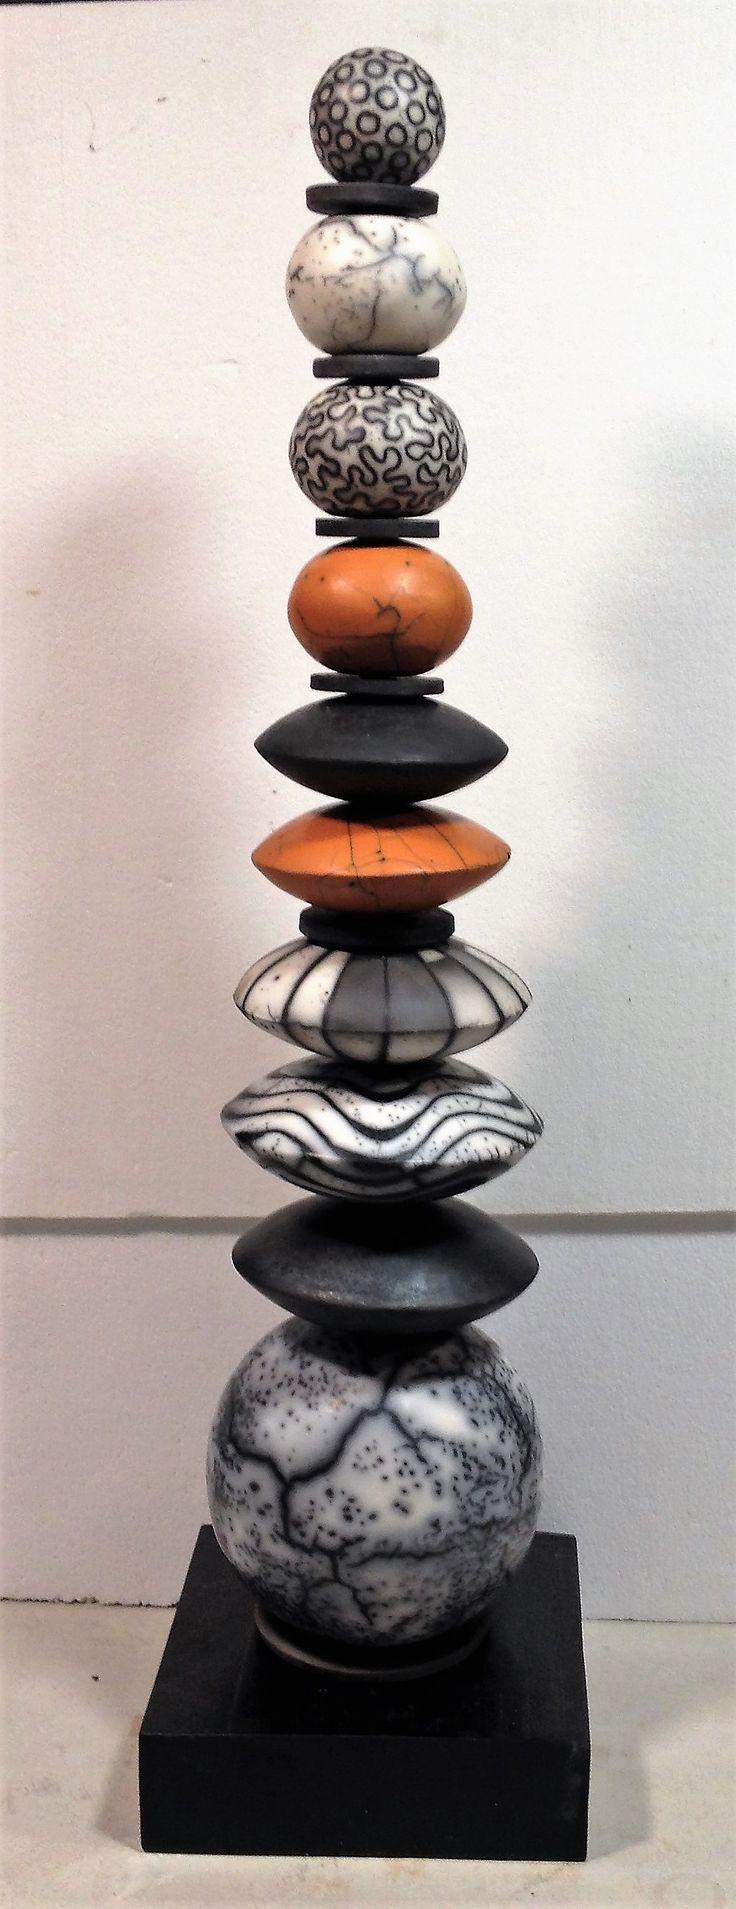 TOTEMIC GEO STRUCTURE, naked raku, terra sig, and carbonized assemblage, by Judith Paisley. www.paisleyceramics.com